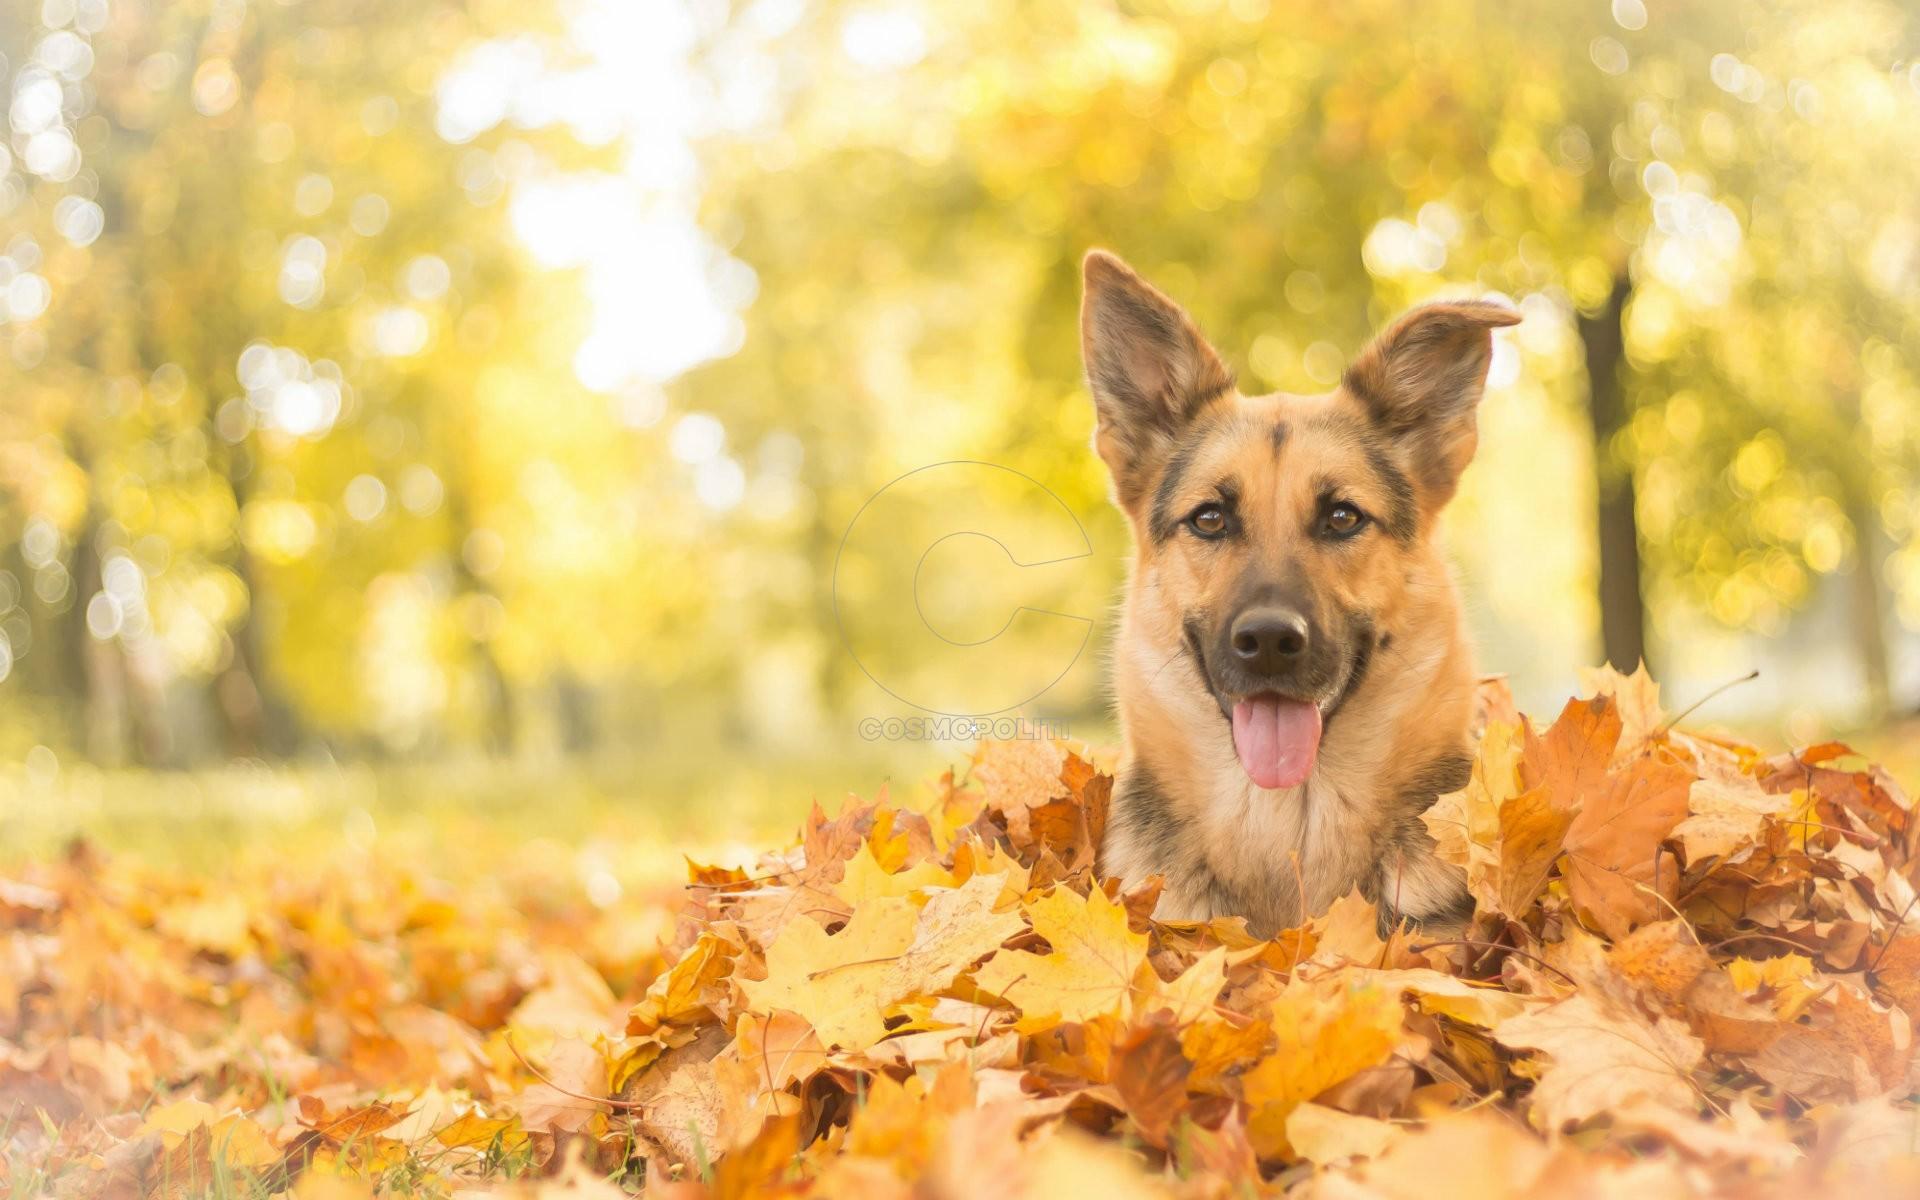 Wallpapers-Of-German-Shepherd-Dogs